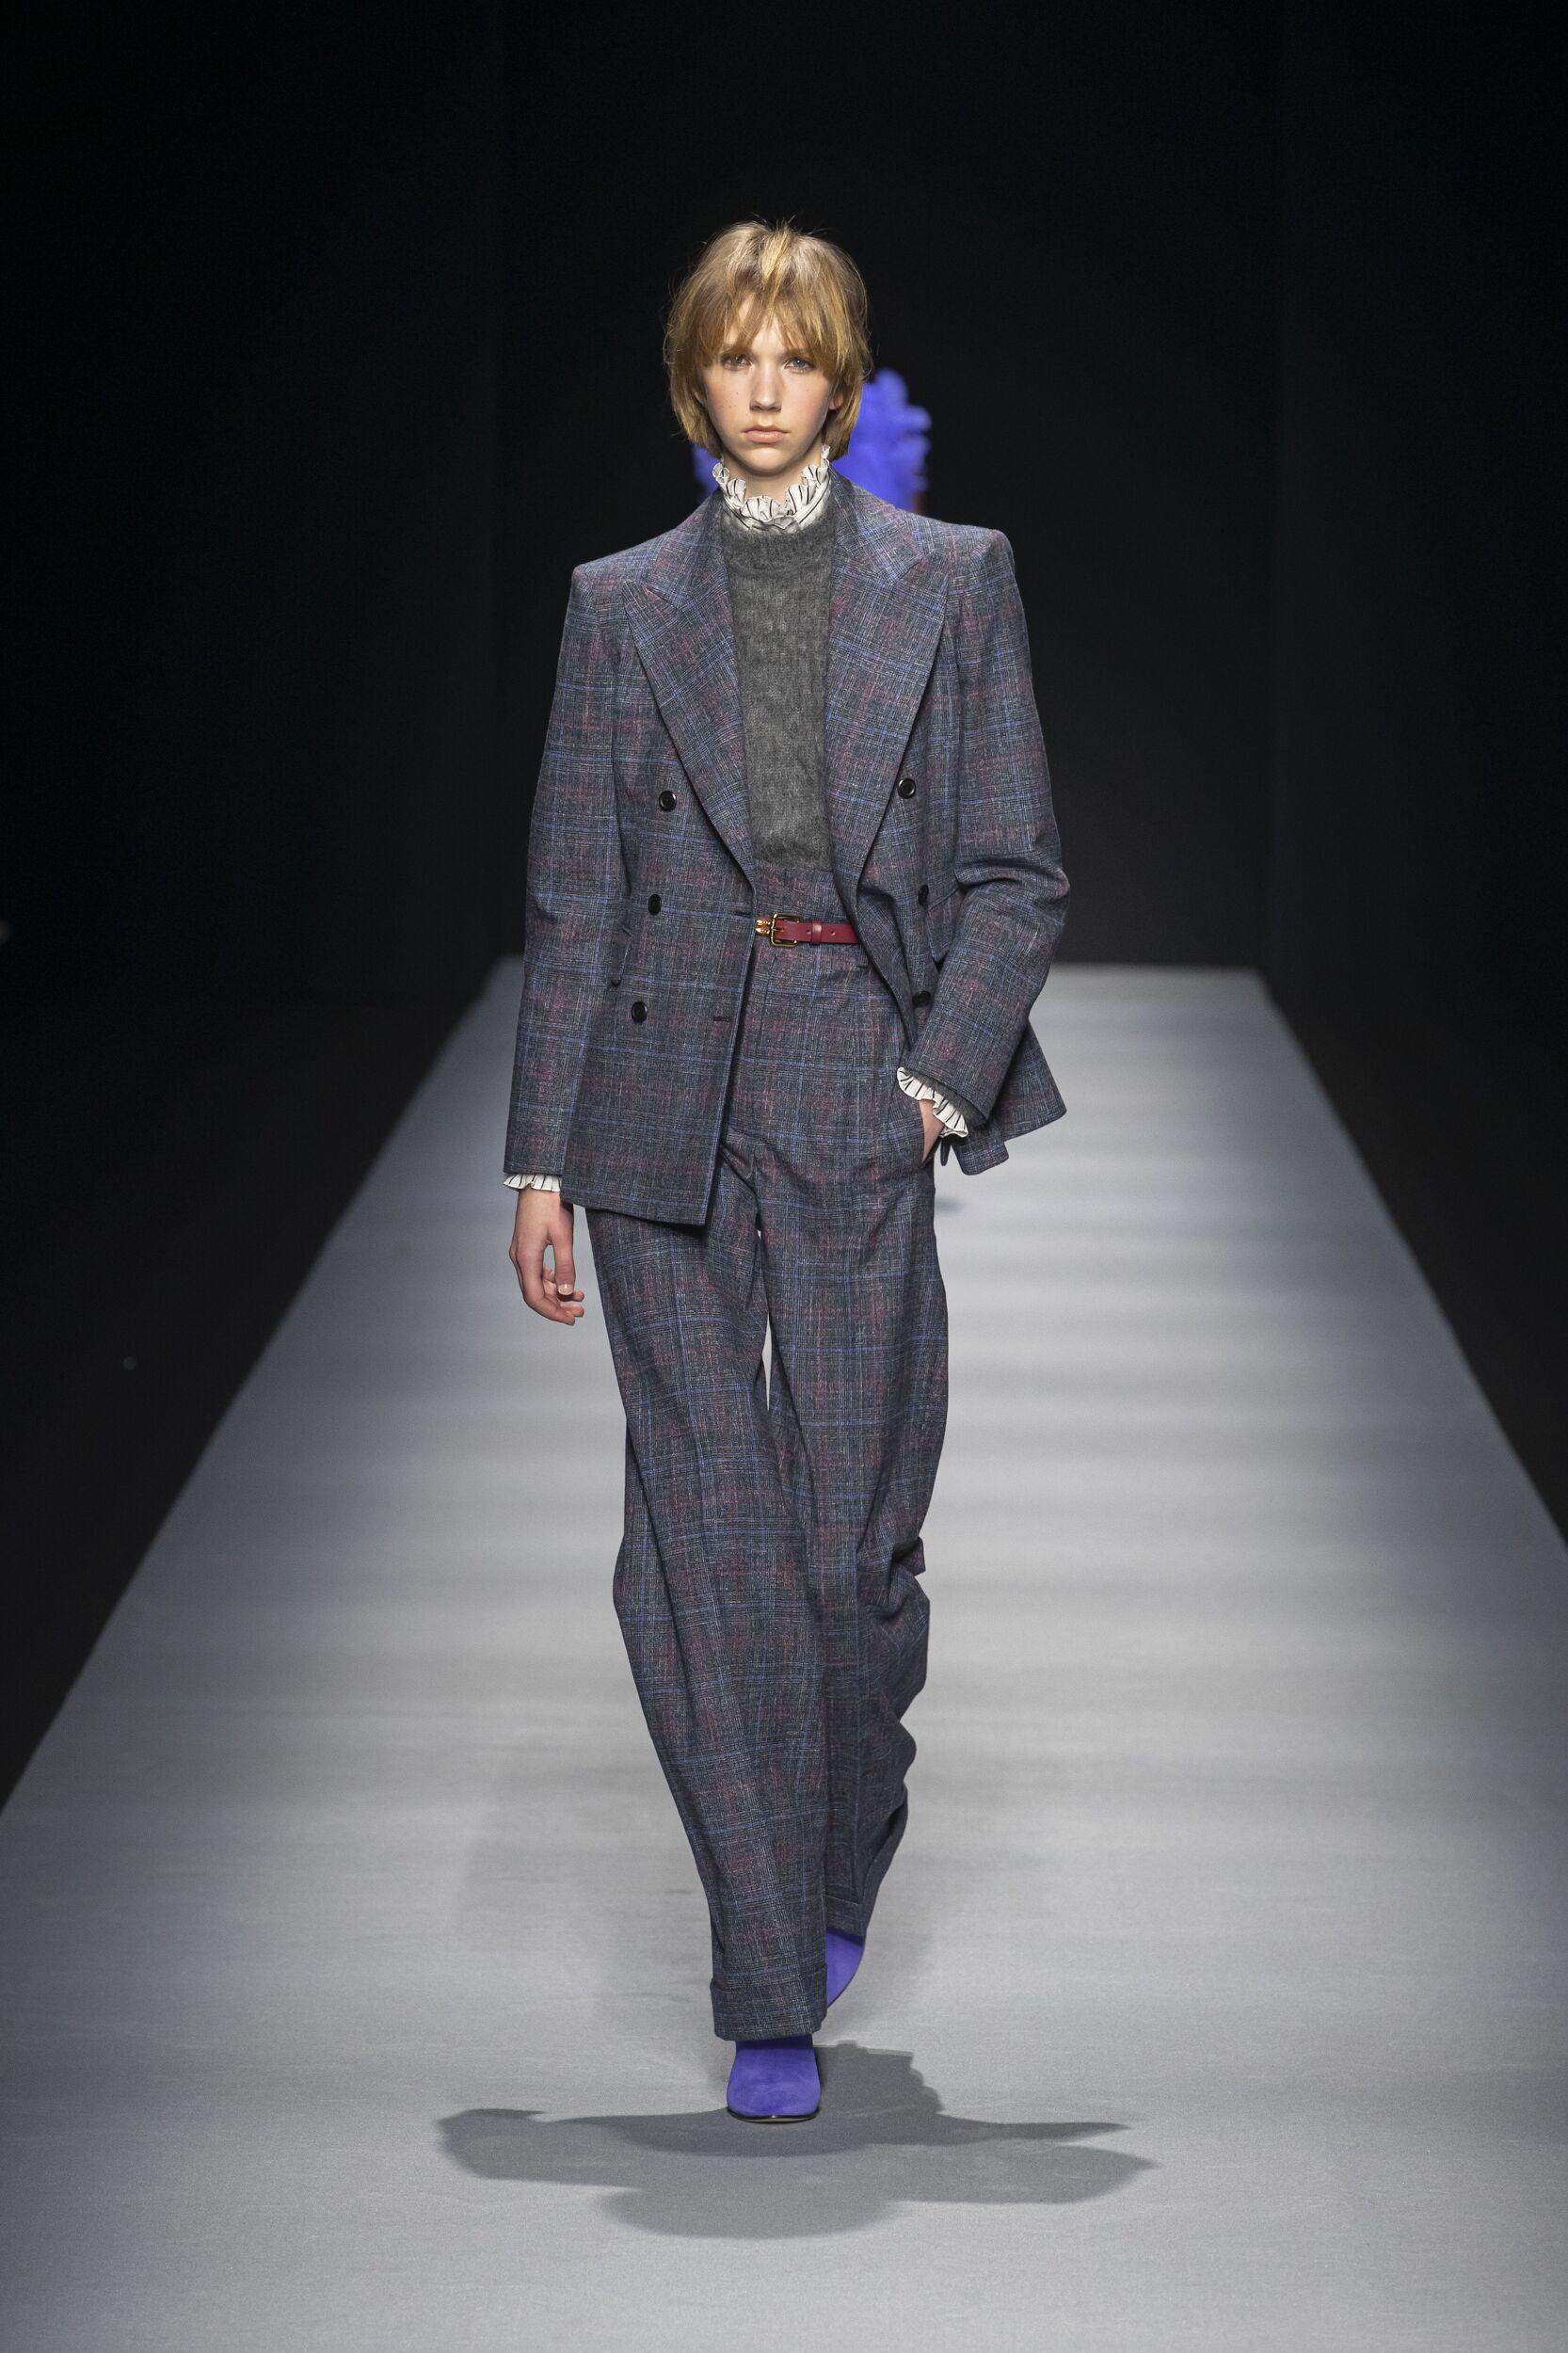 Runway Alberta Ferretti Fall Winter 2020 Women's Collection Milan Fashion Week